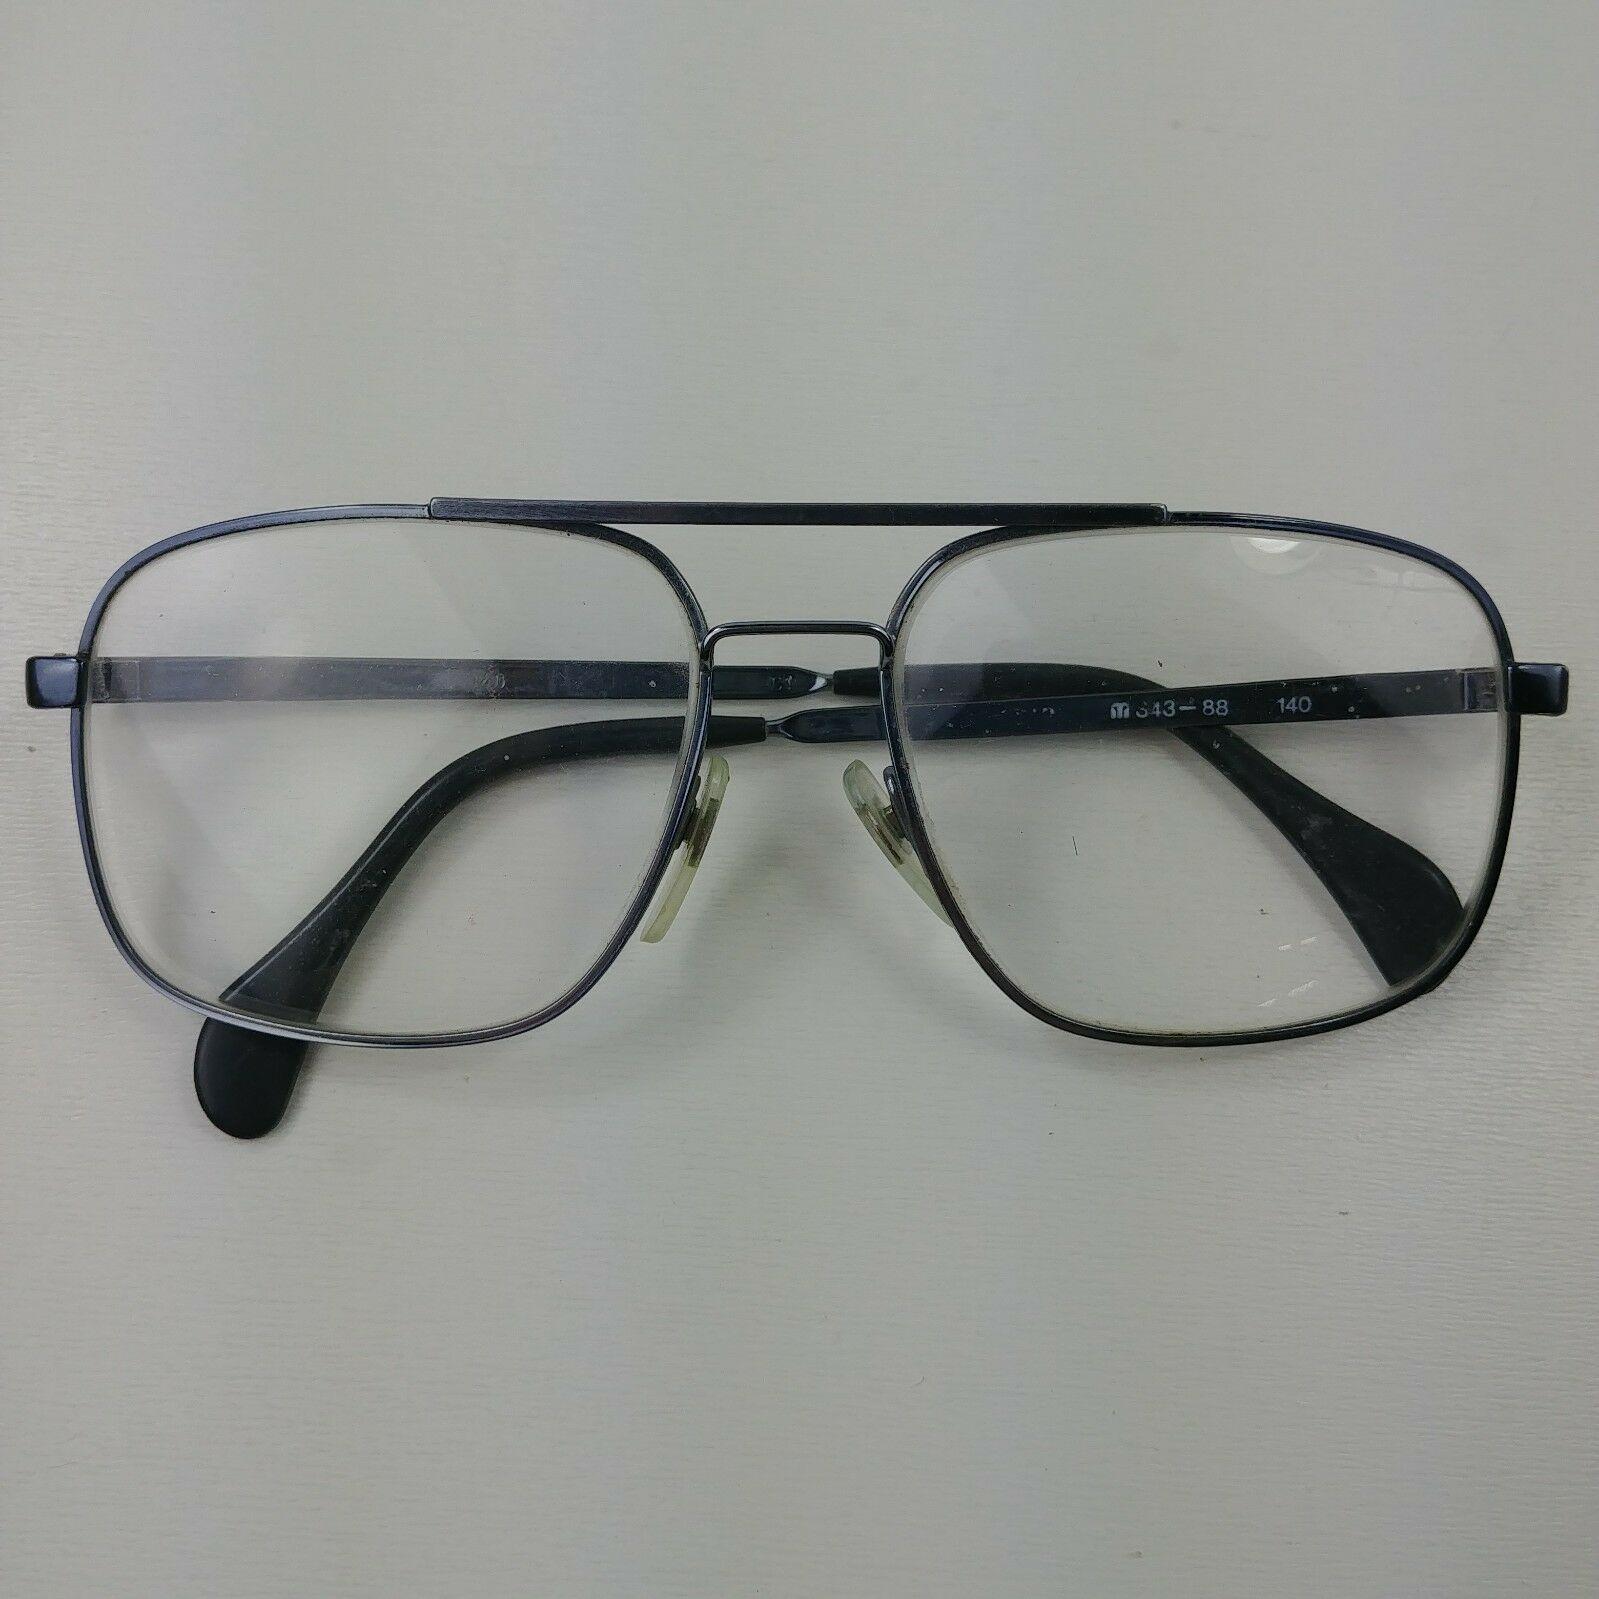 7303af55e148 Vintage Retro Grandpa Reading Glasses 160 343-88 140 #3